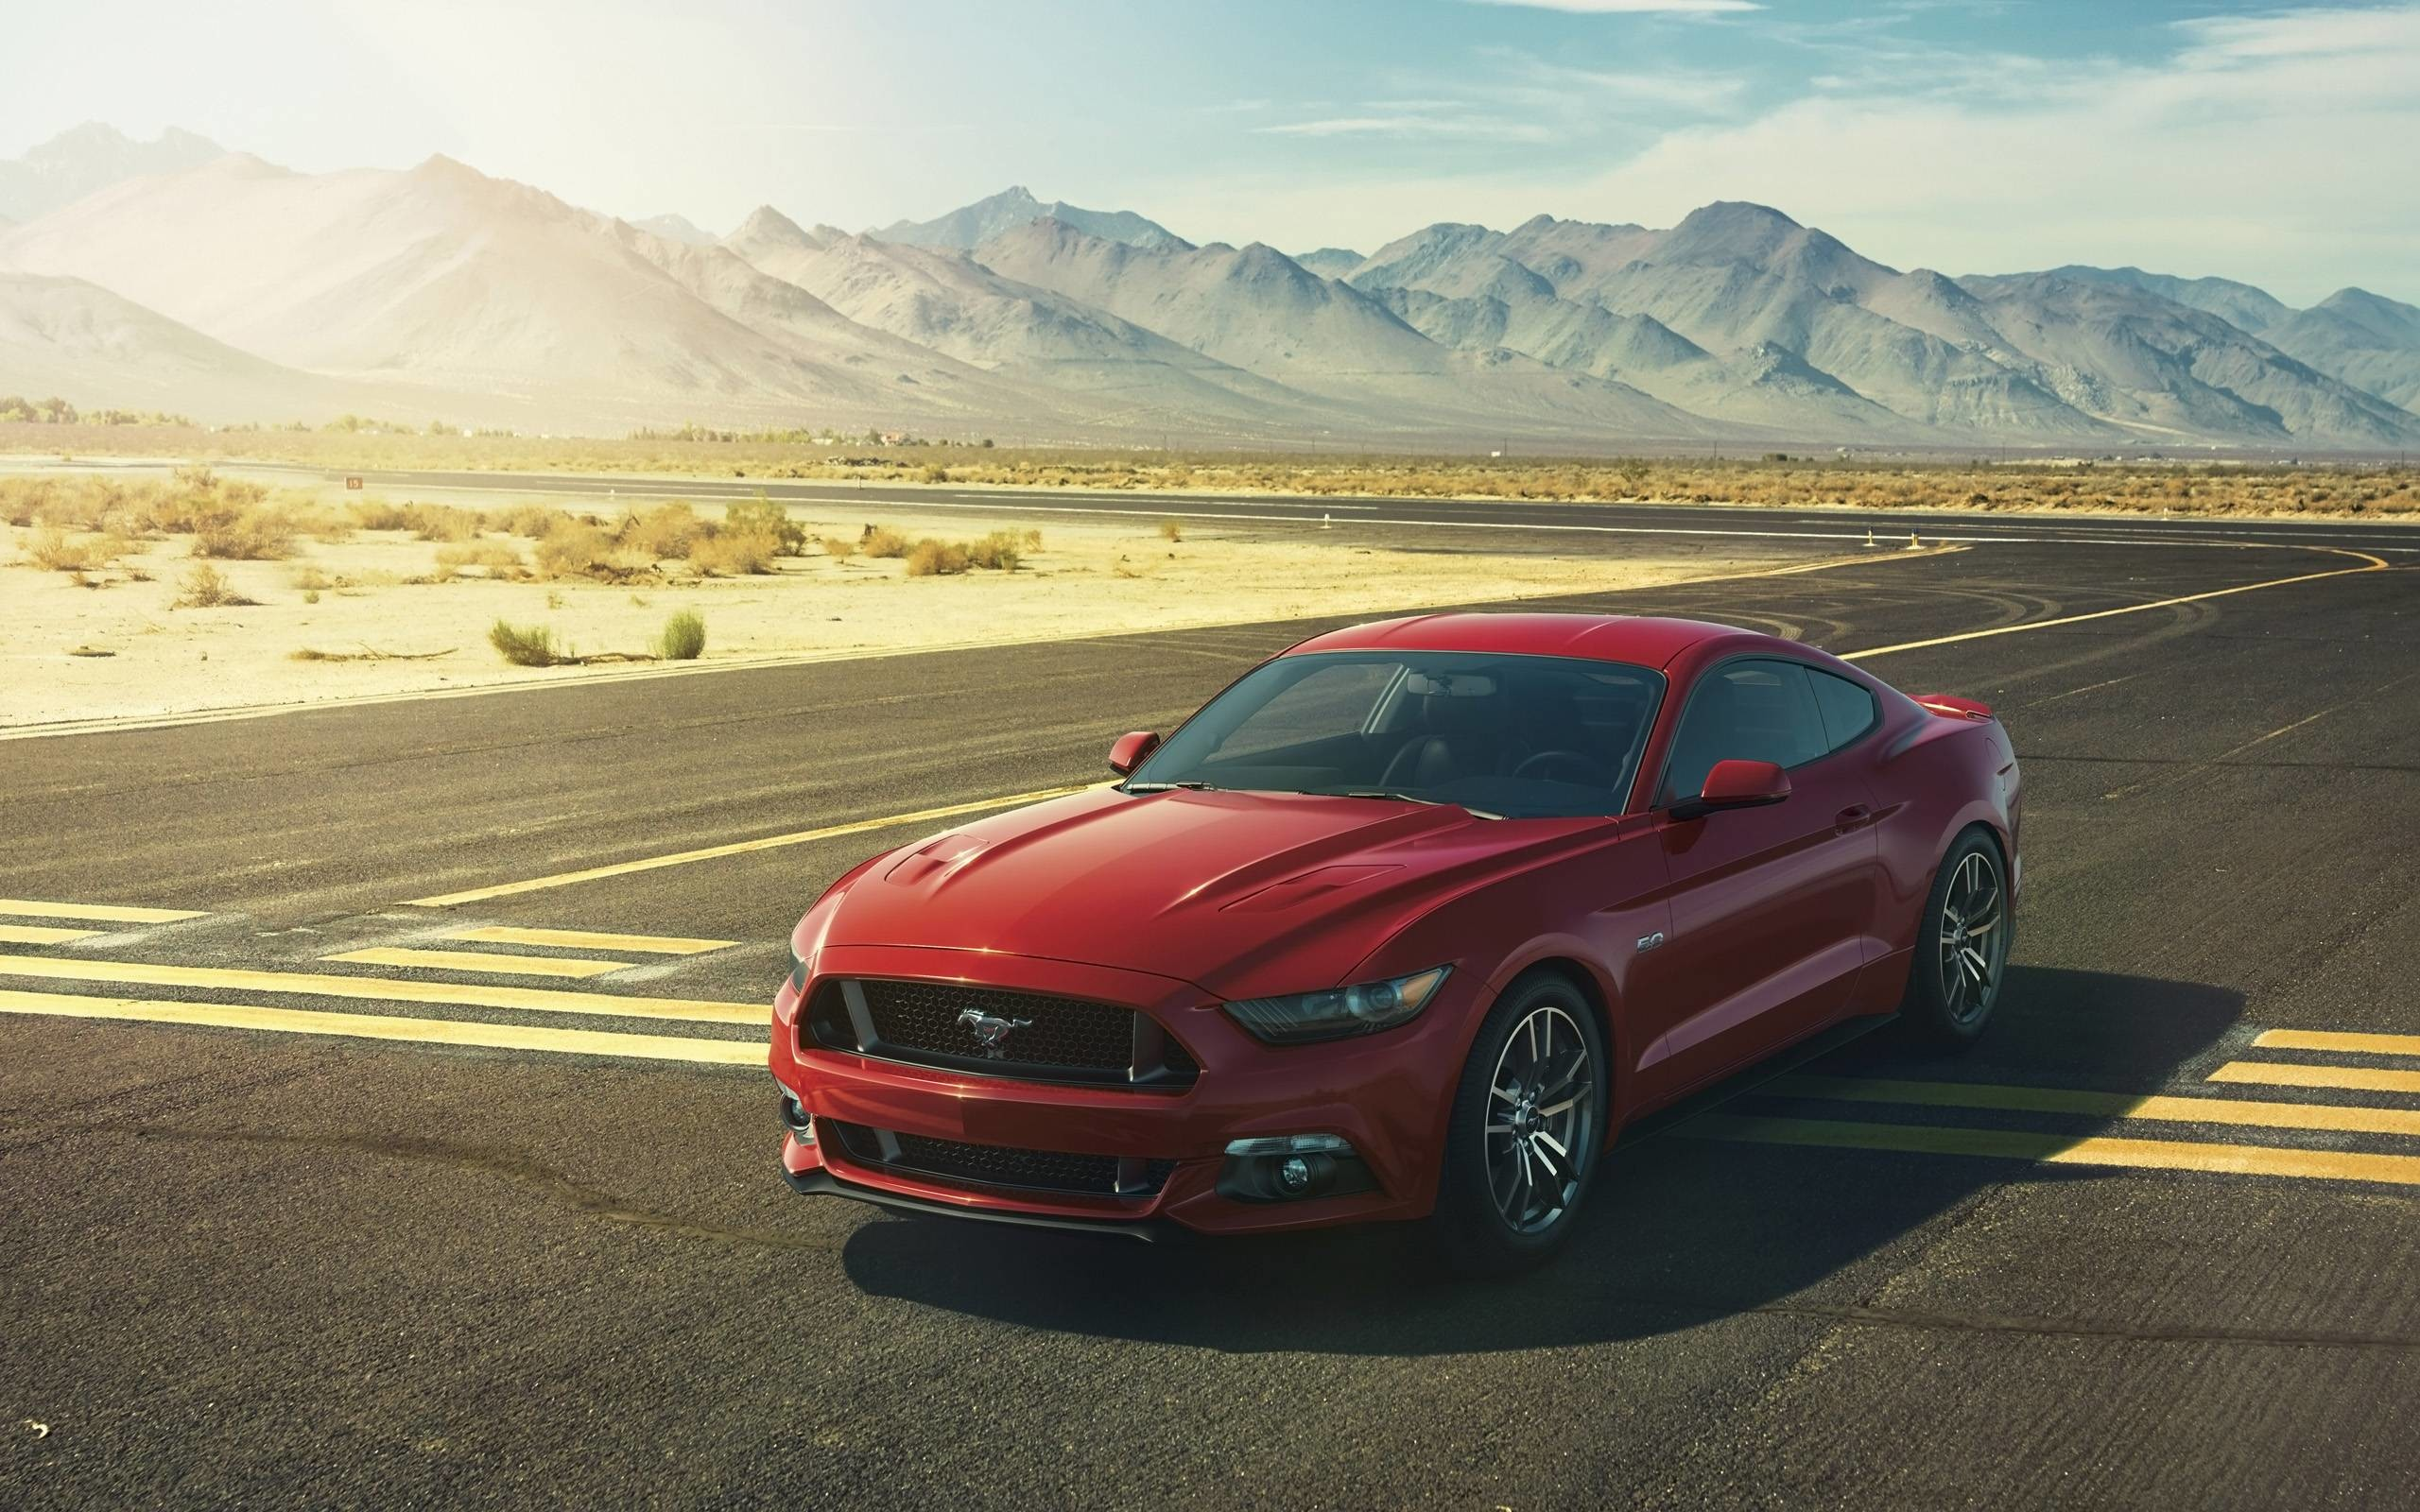 Ford Mustang 2015 Wallpaper | HD Car Wallpapers